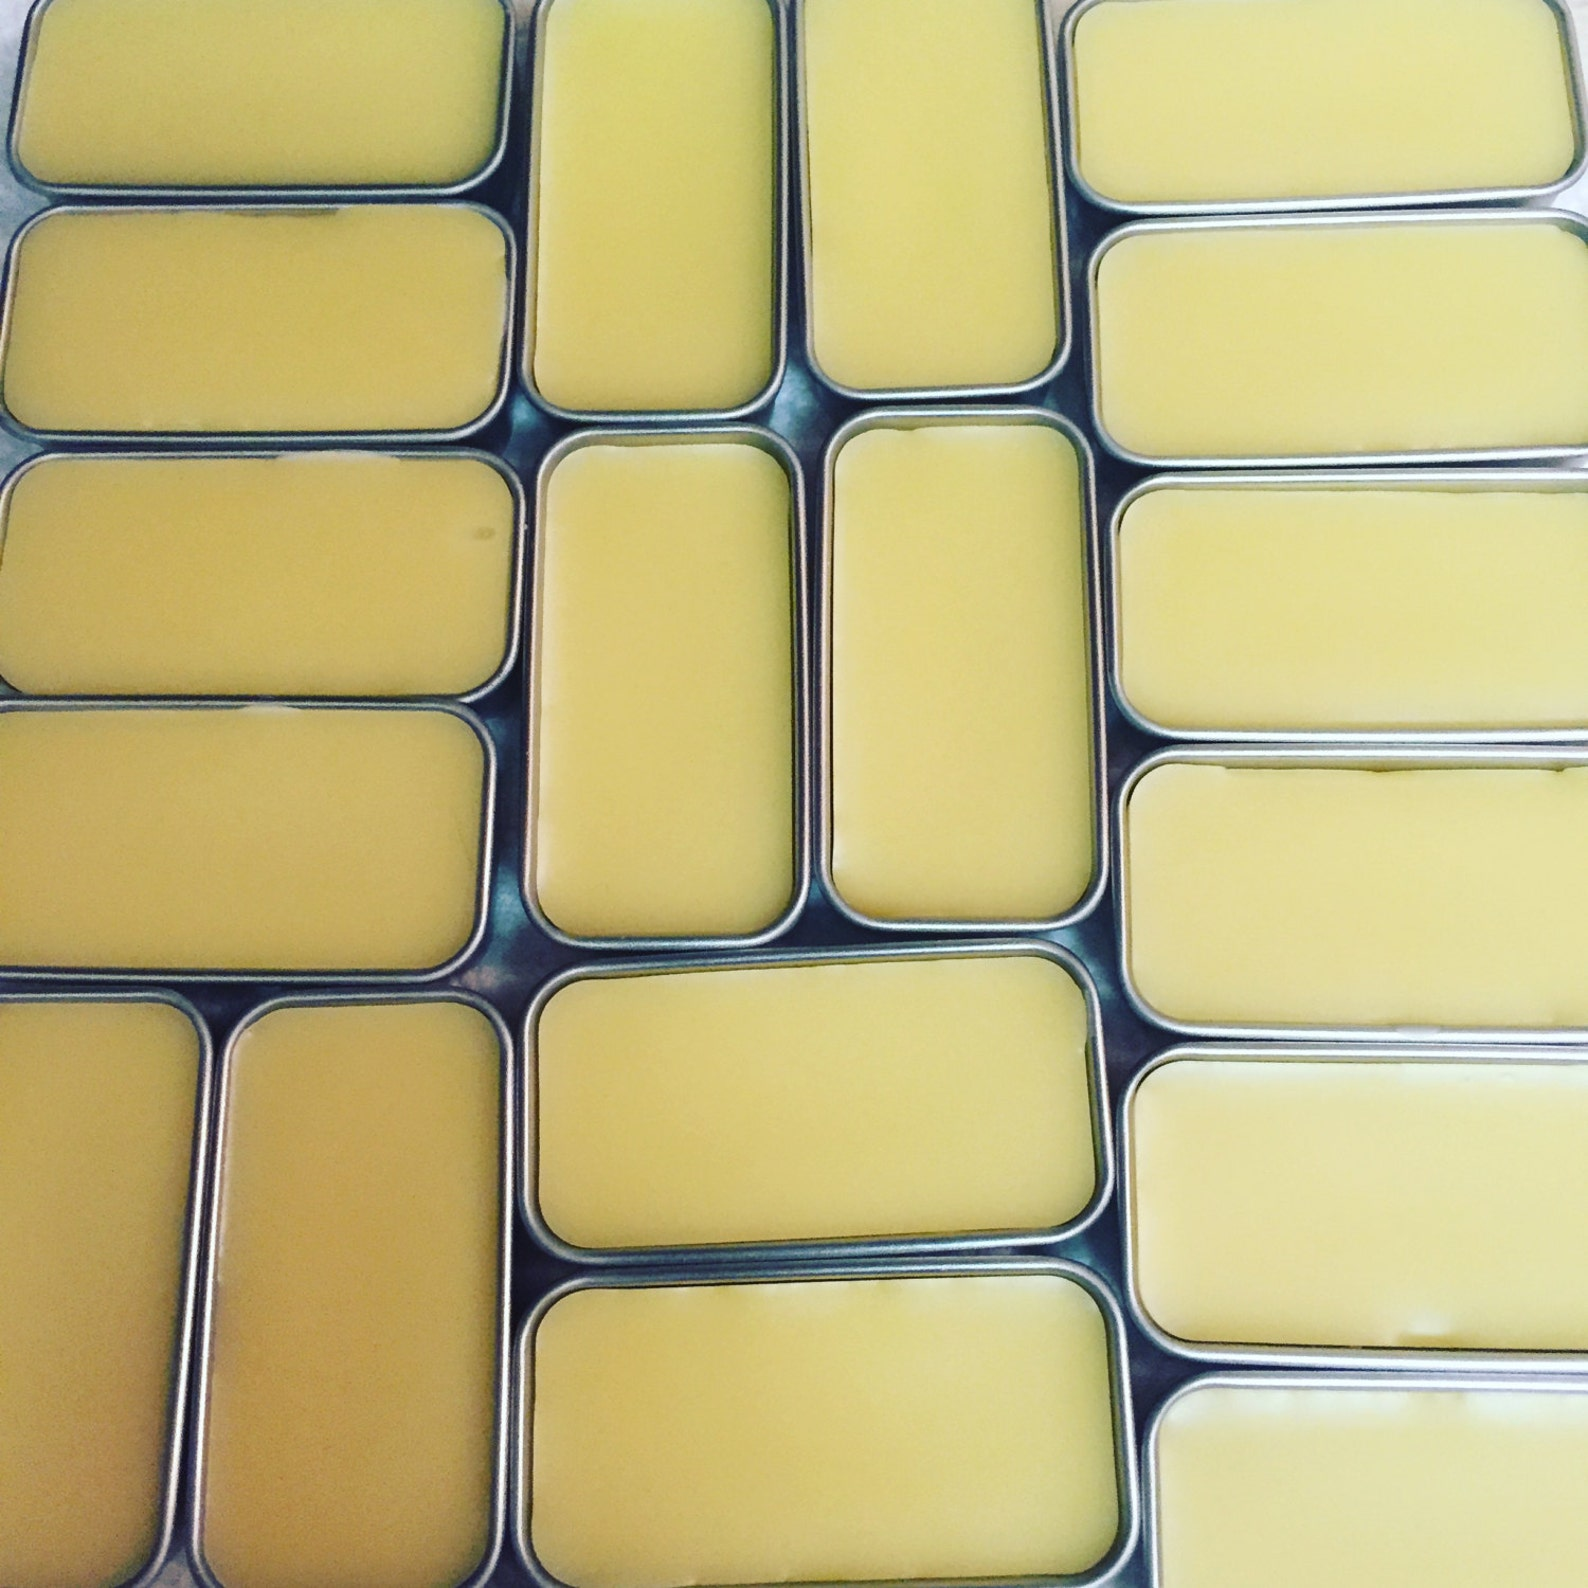 etsy.com - Honey Lemon Cuticle Cream